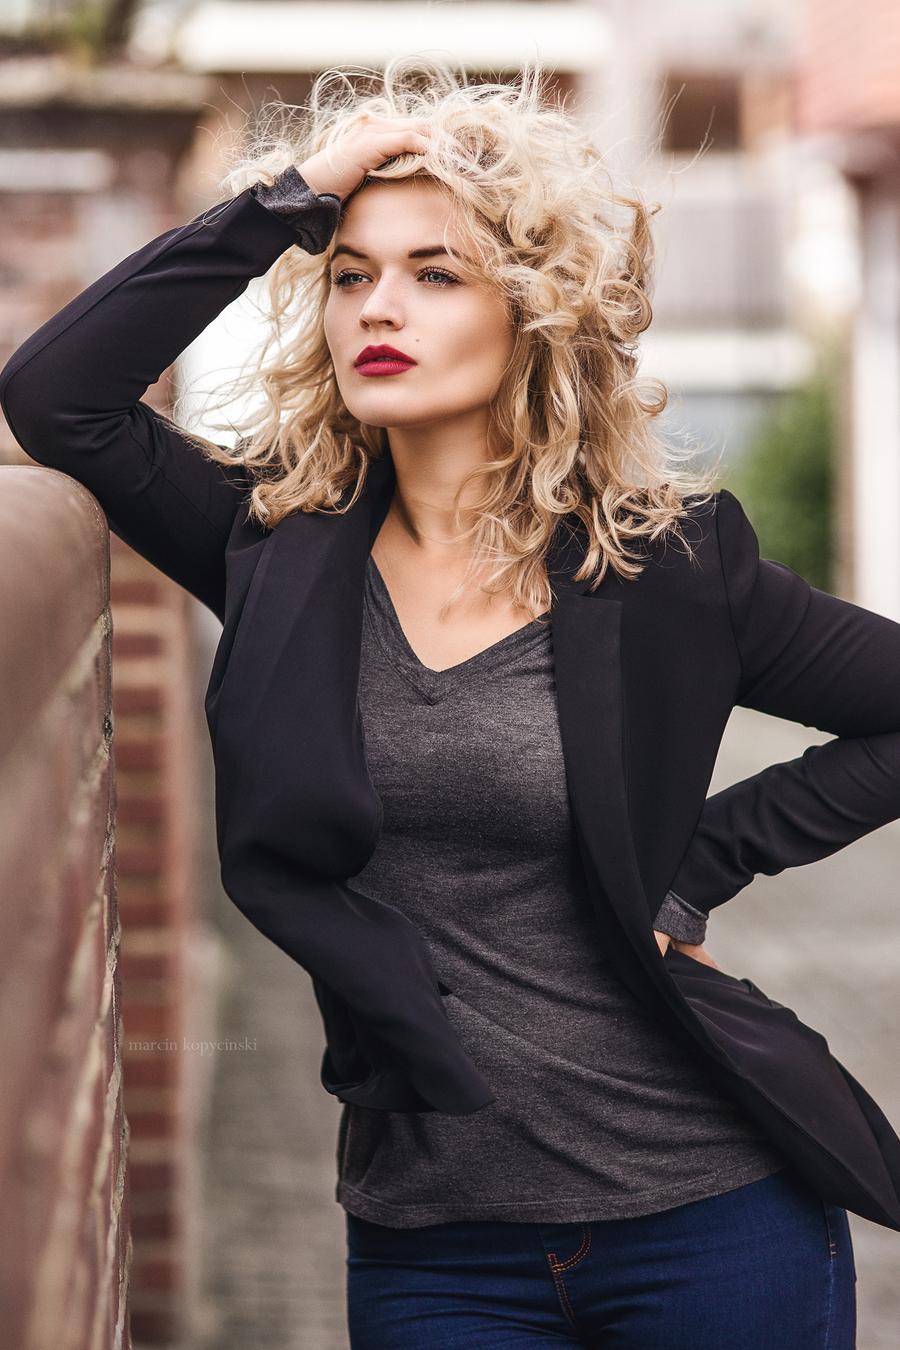 Hyperballad / Photography by Marcin K, Model Jessica Megan / Uploaded 9th October 2016 @ 08:25 PM